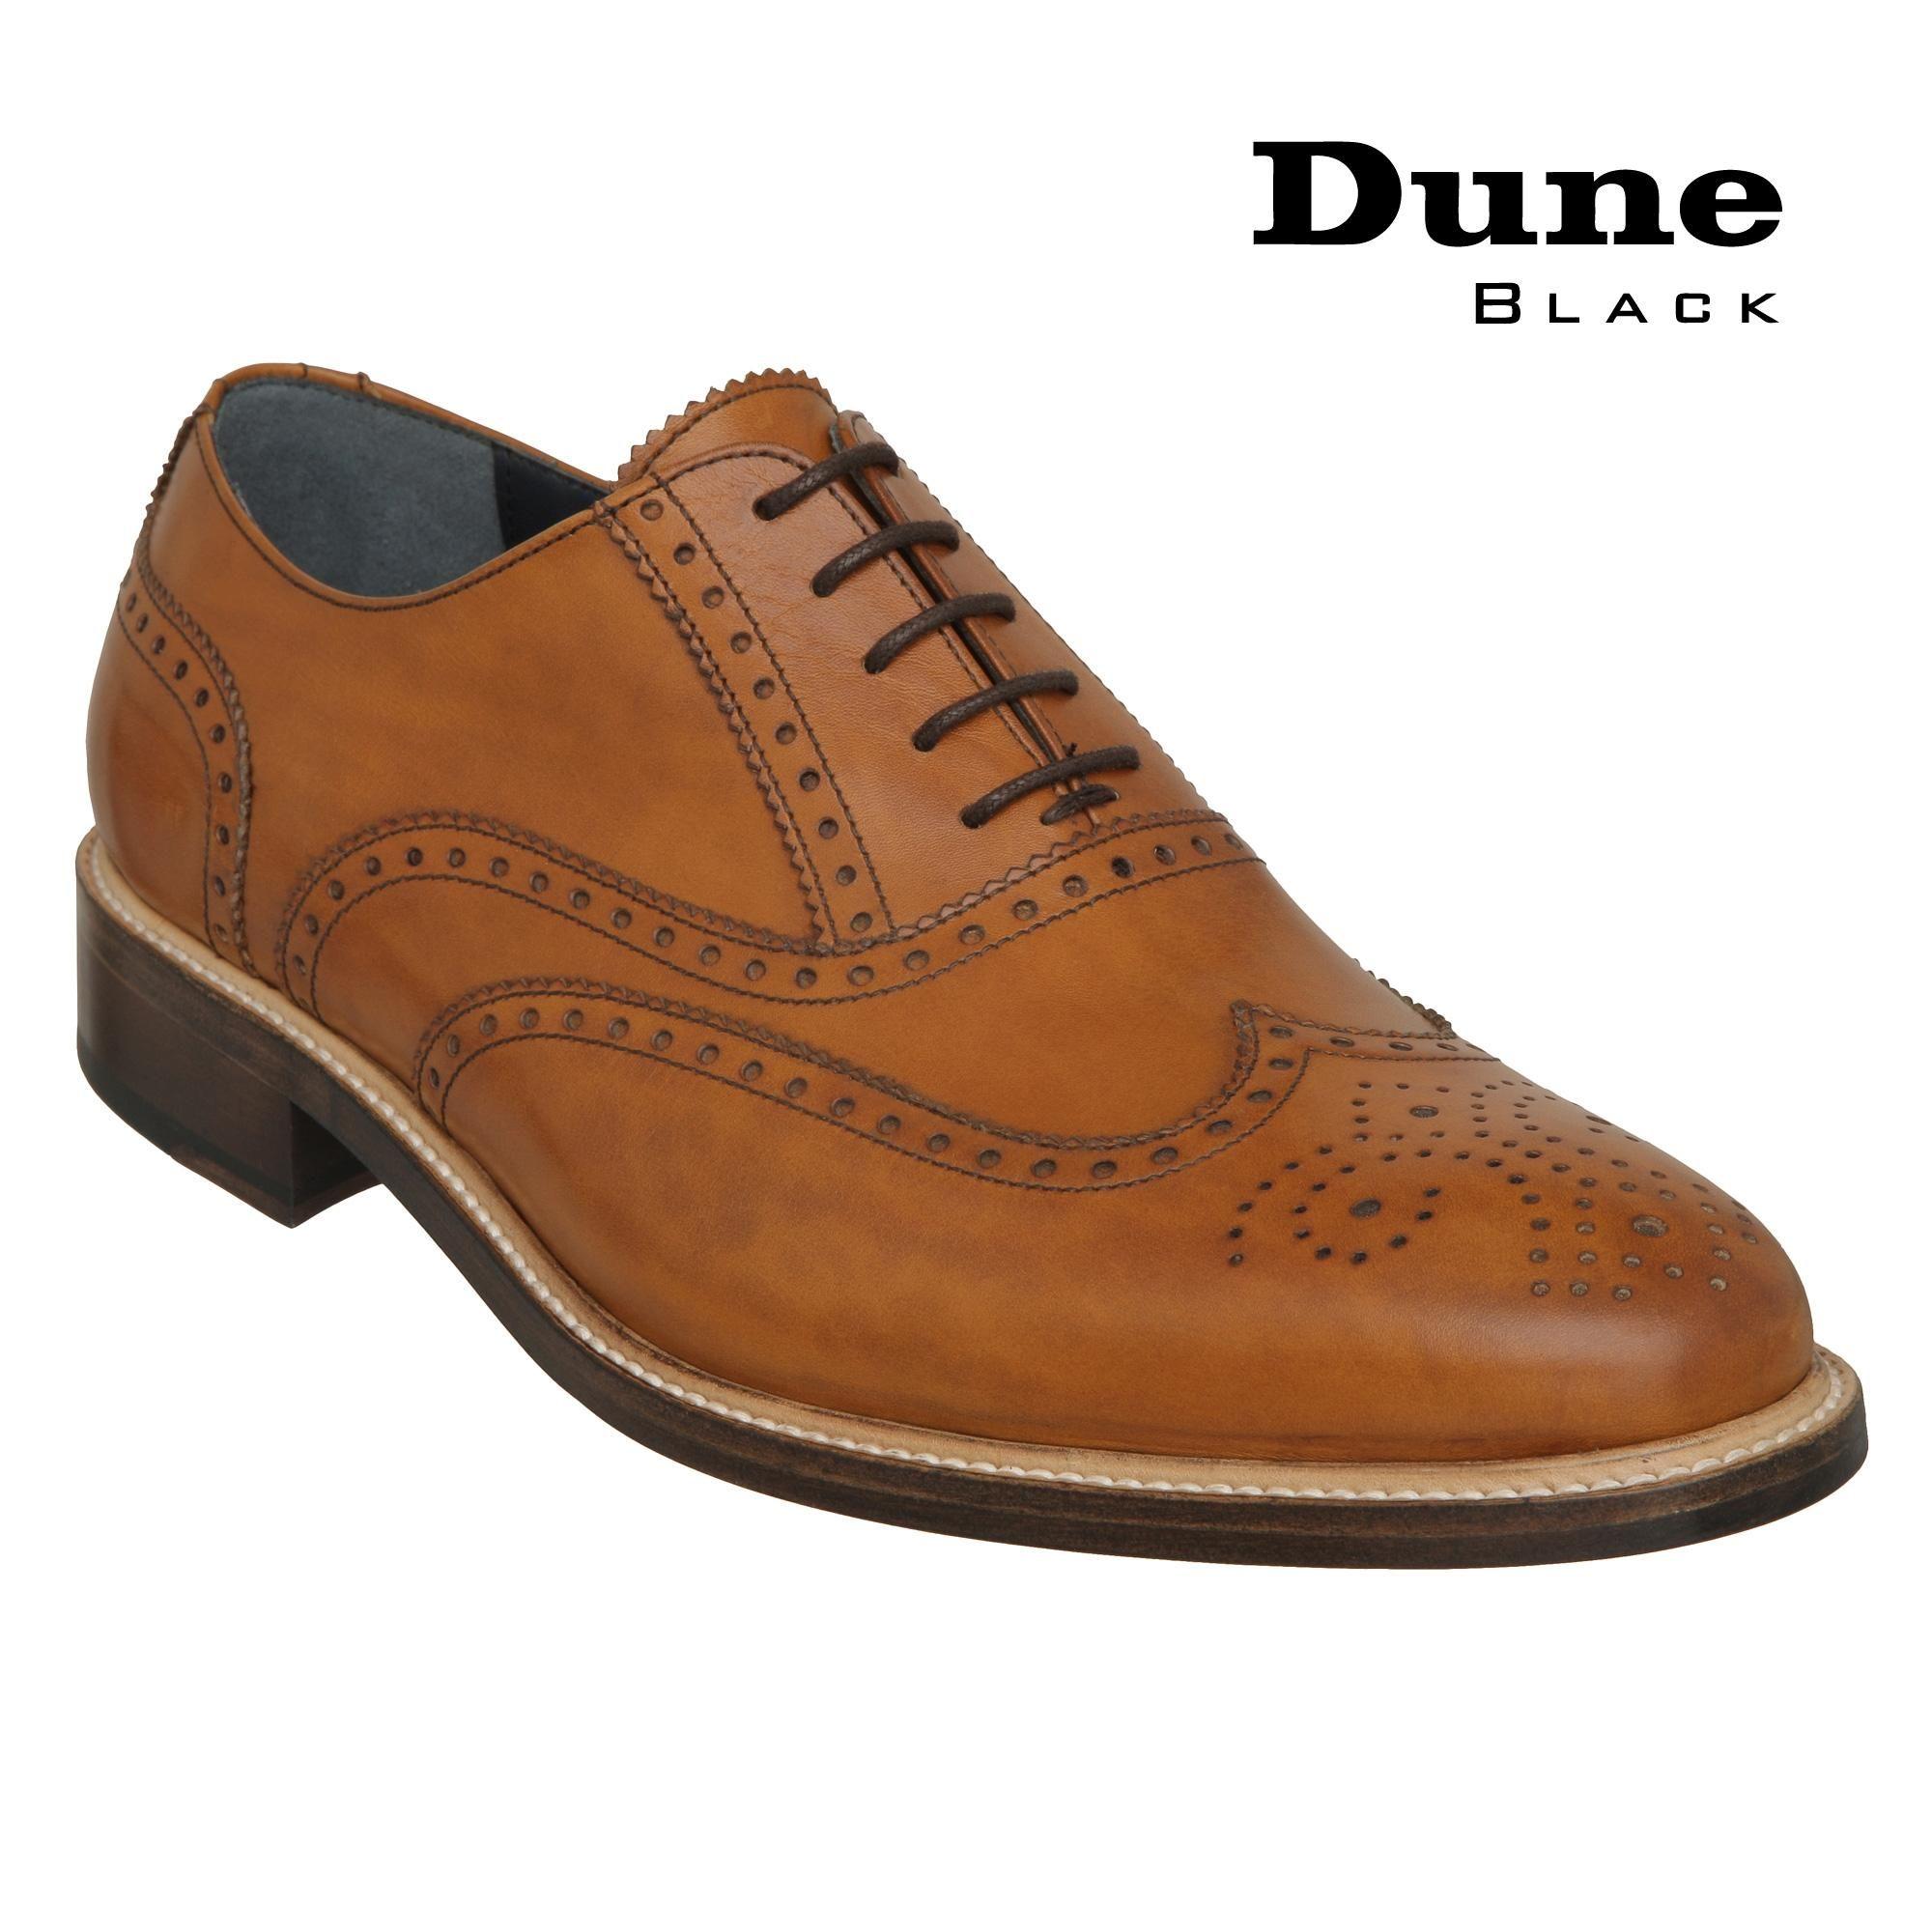 Dune Black Classic Calf Leather